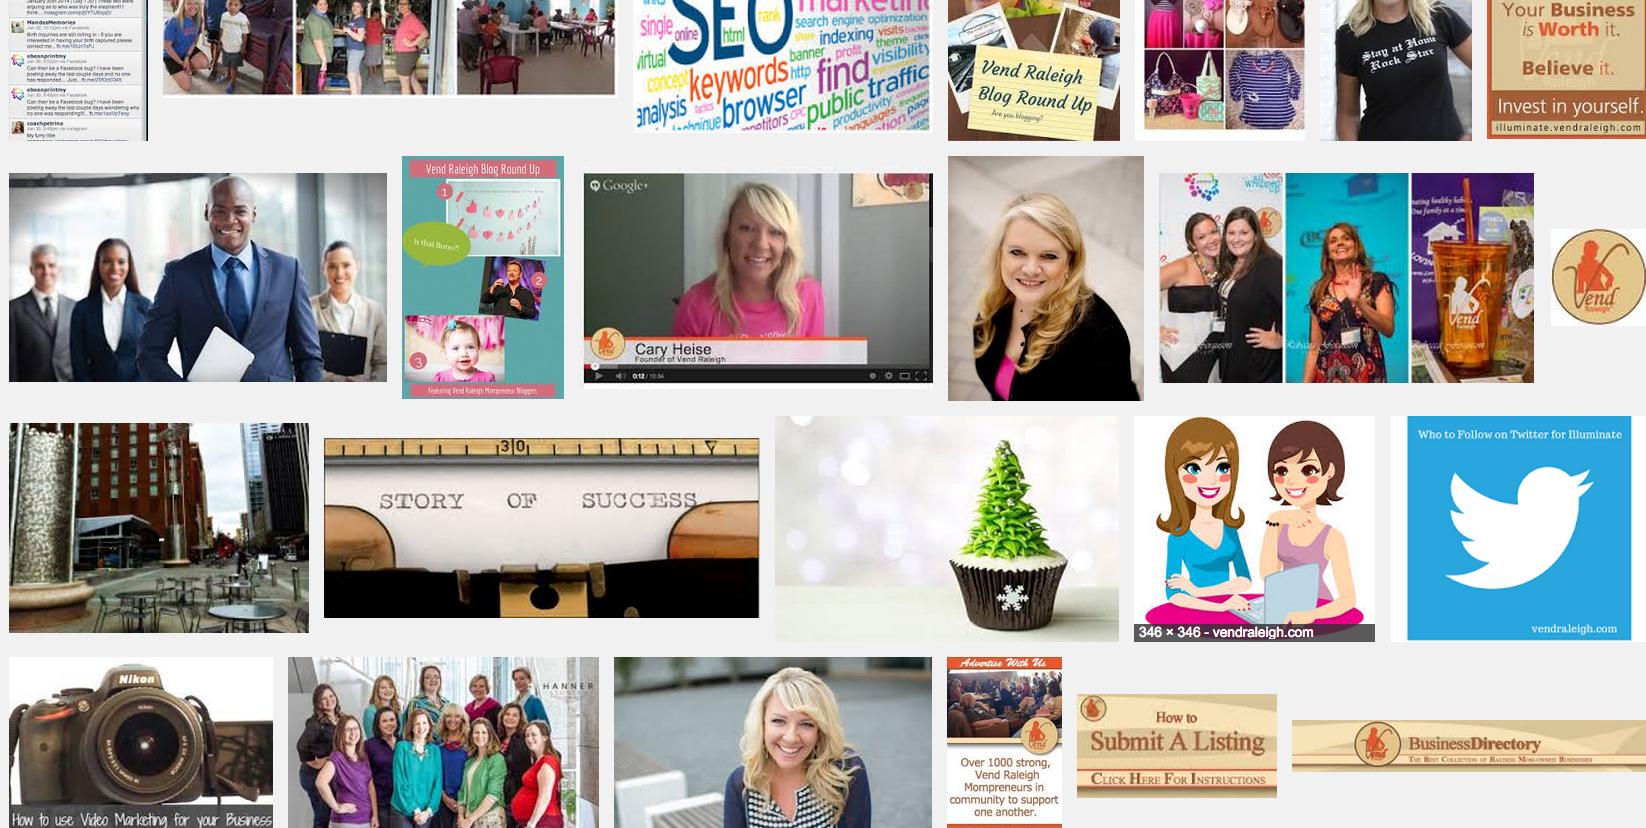 Vend Raleigh Small Business Women